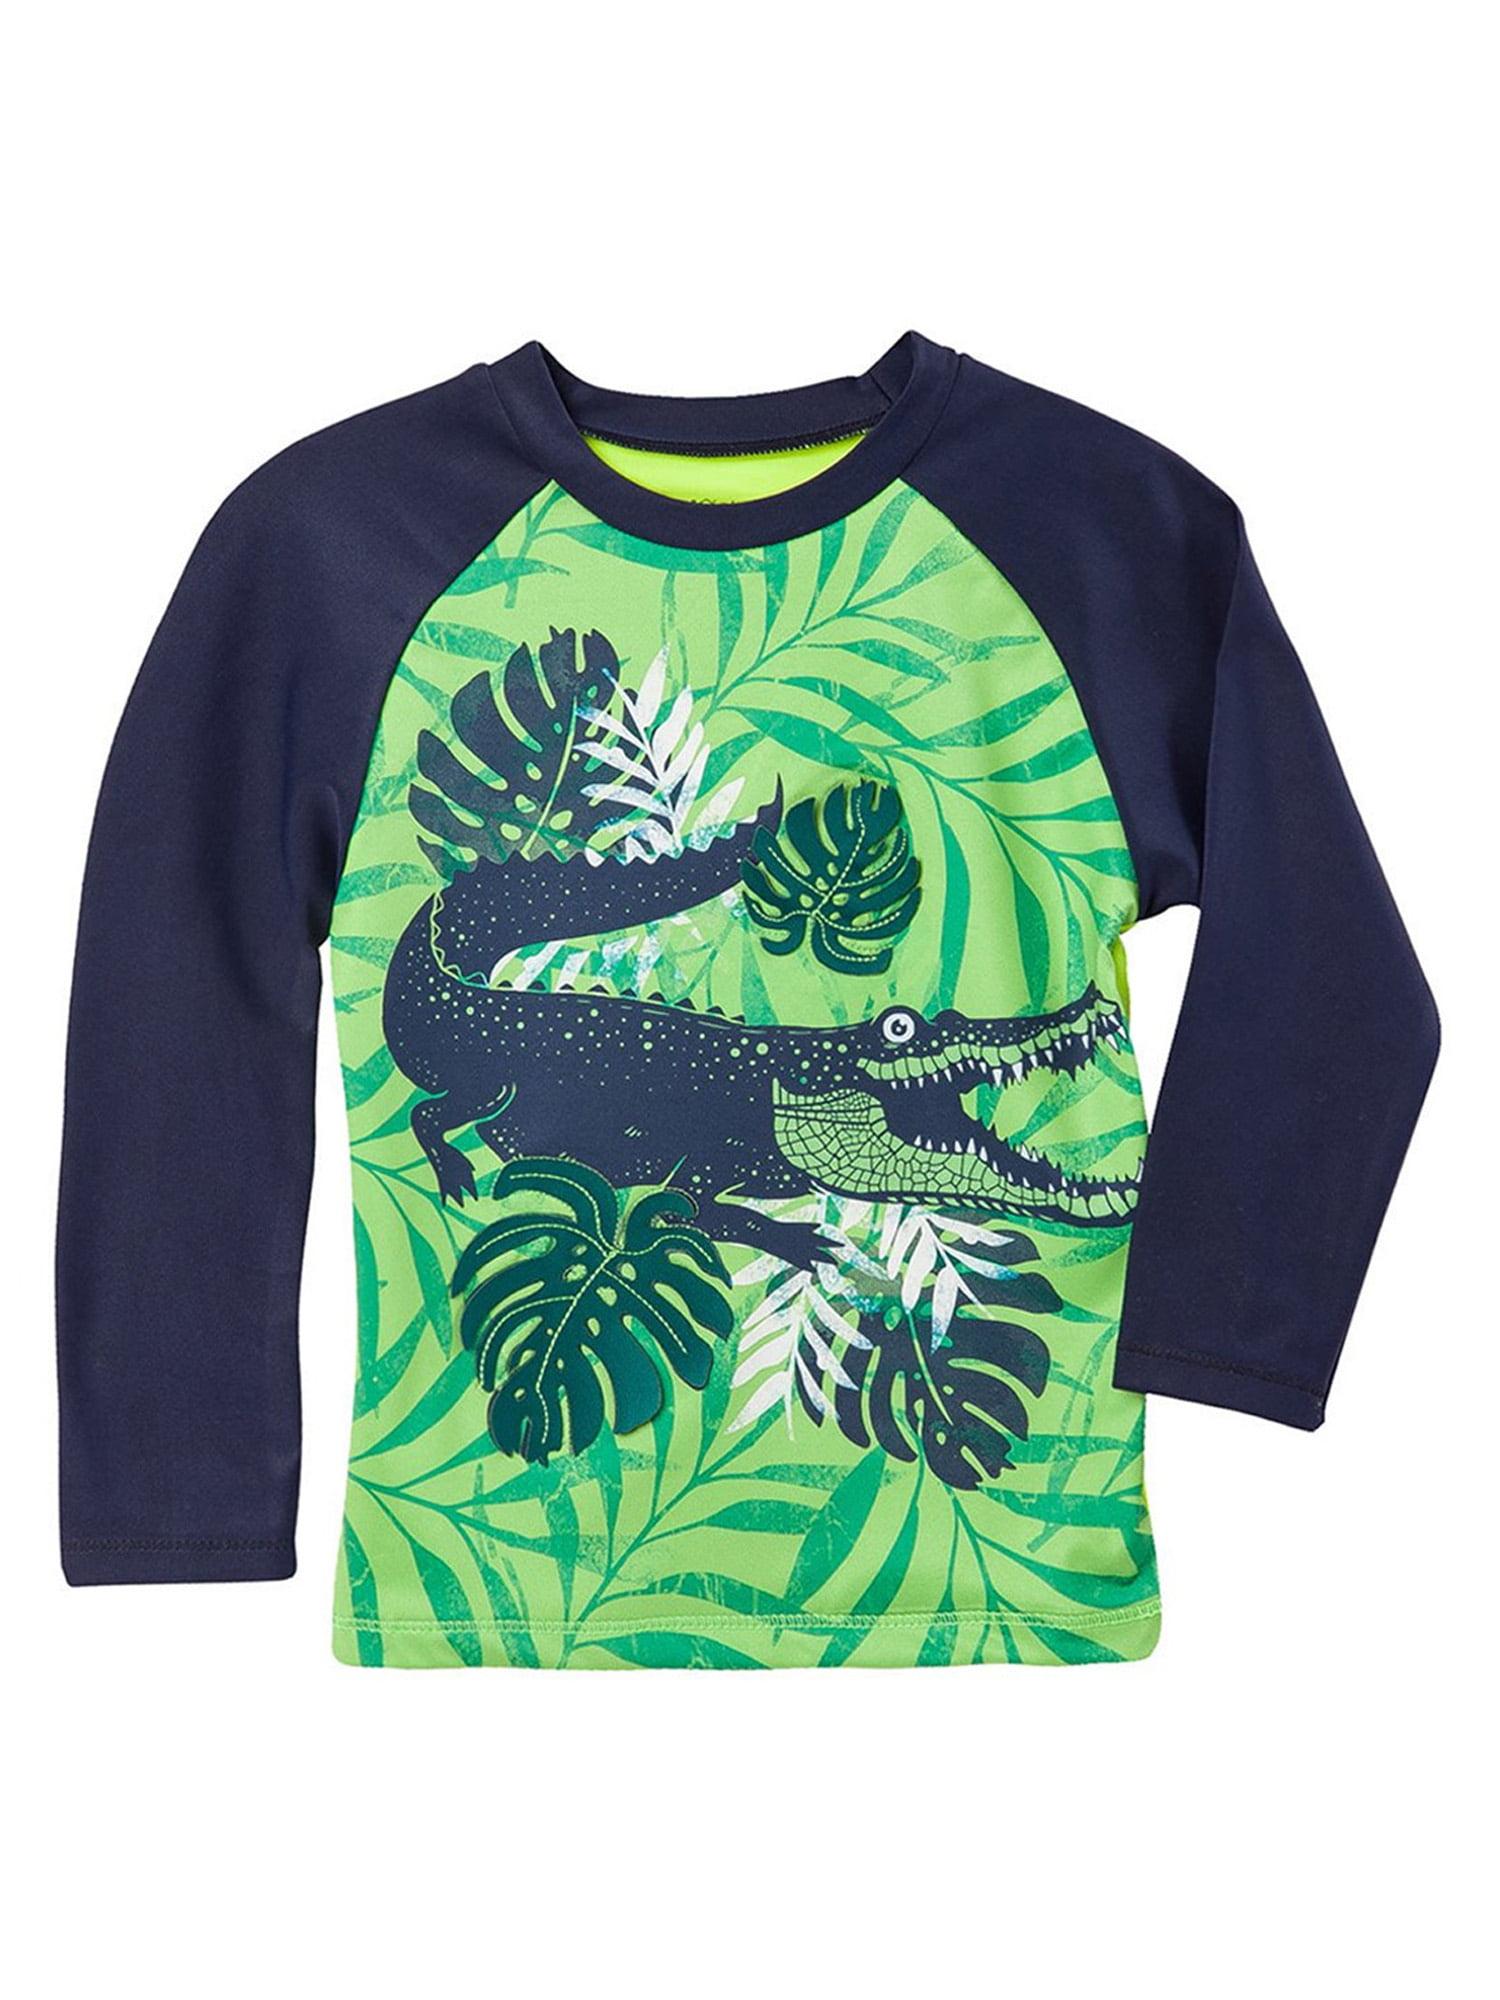 OFFCORSS Toddler Boy Long Sleeve Rashguard Swimsuit | Trajes de Baño para Niños